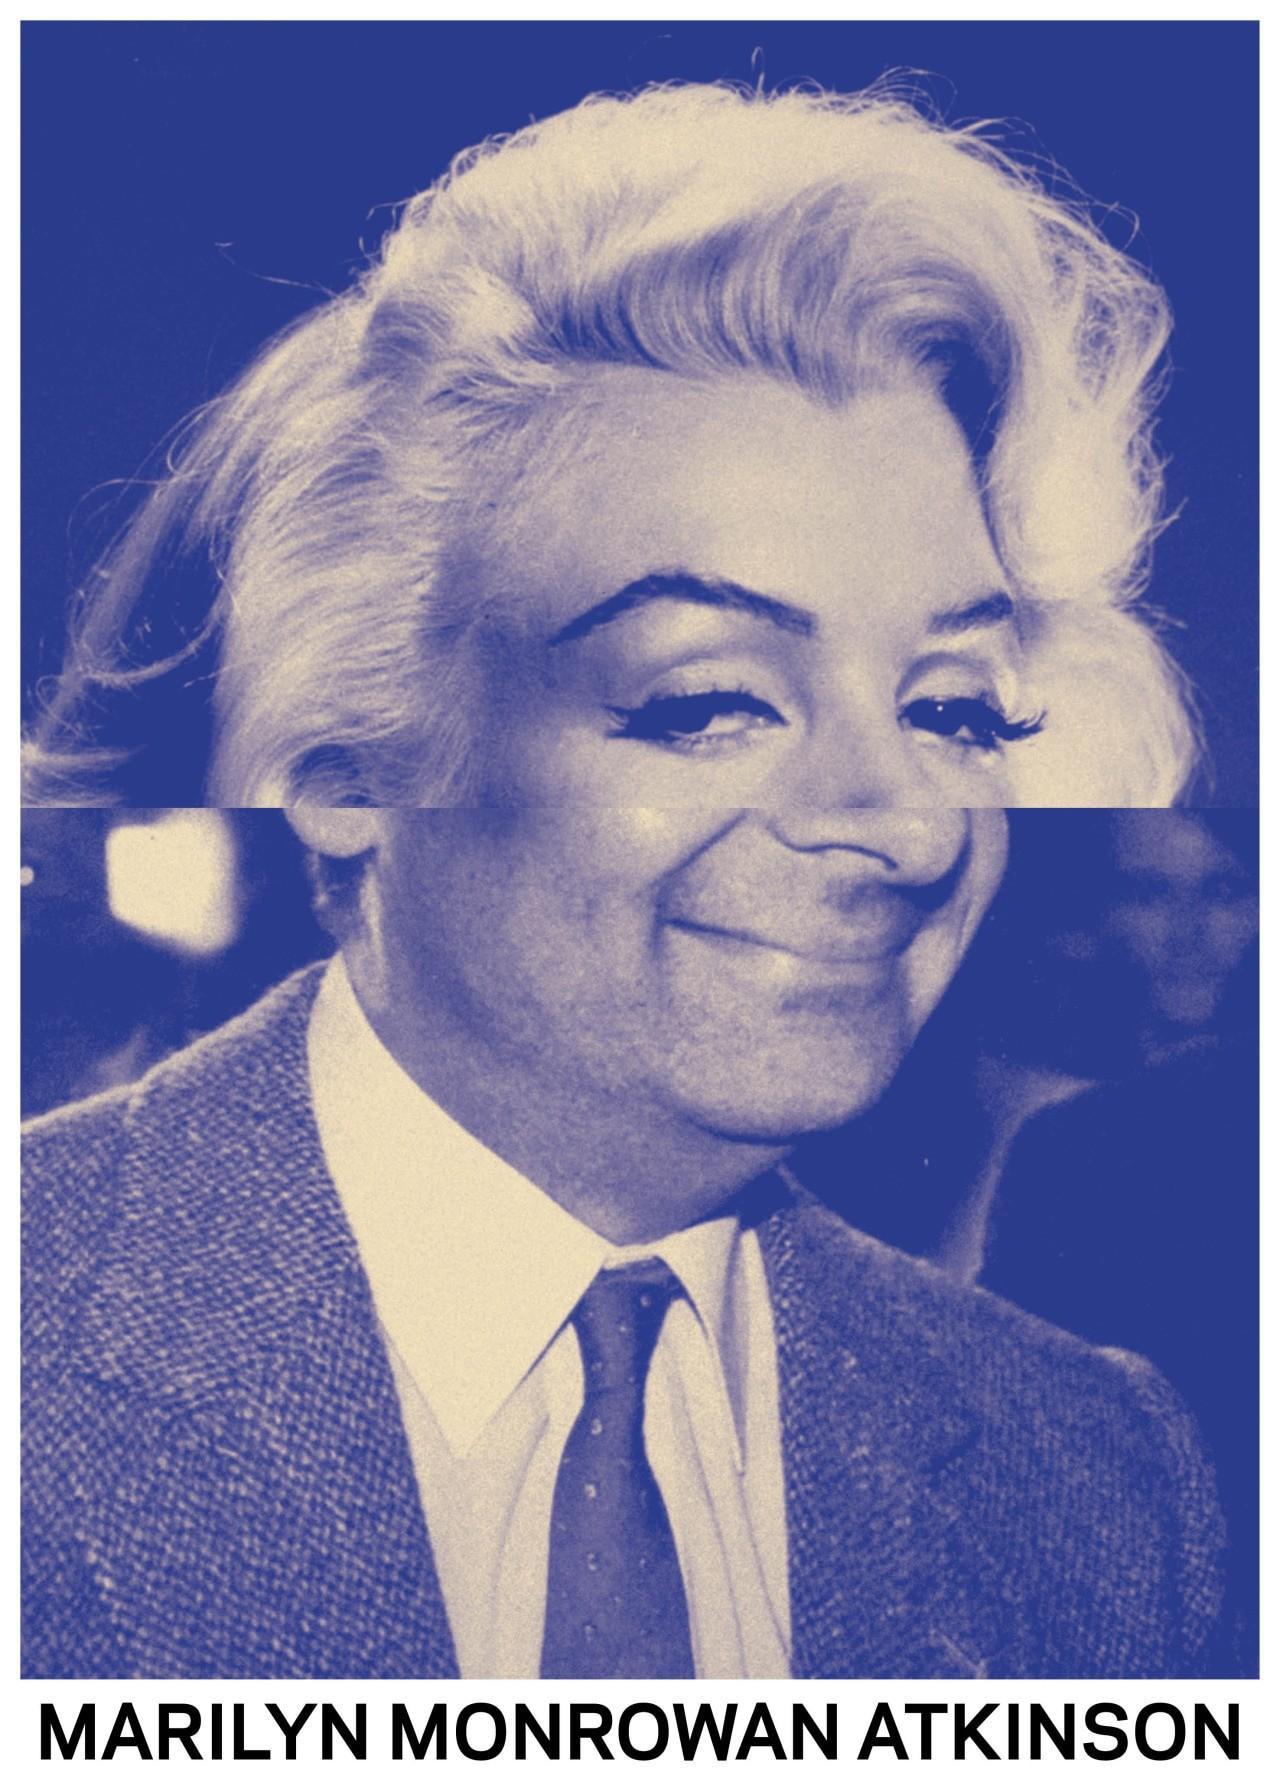 Marilyn monrowan atkinson